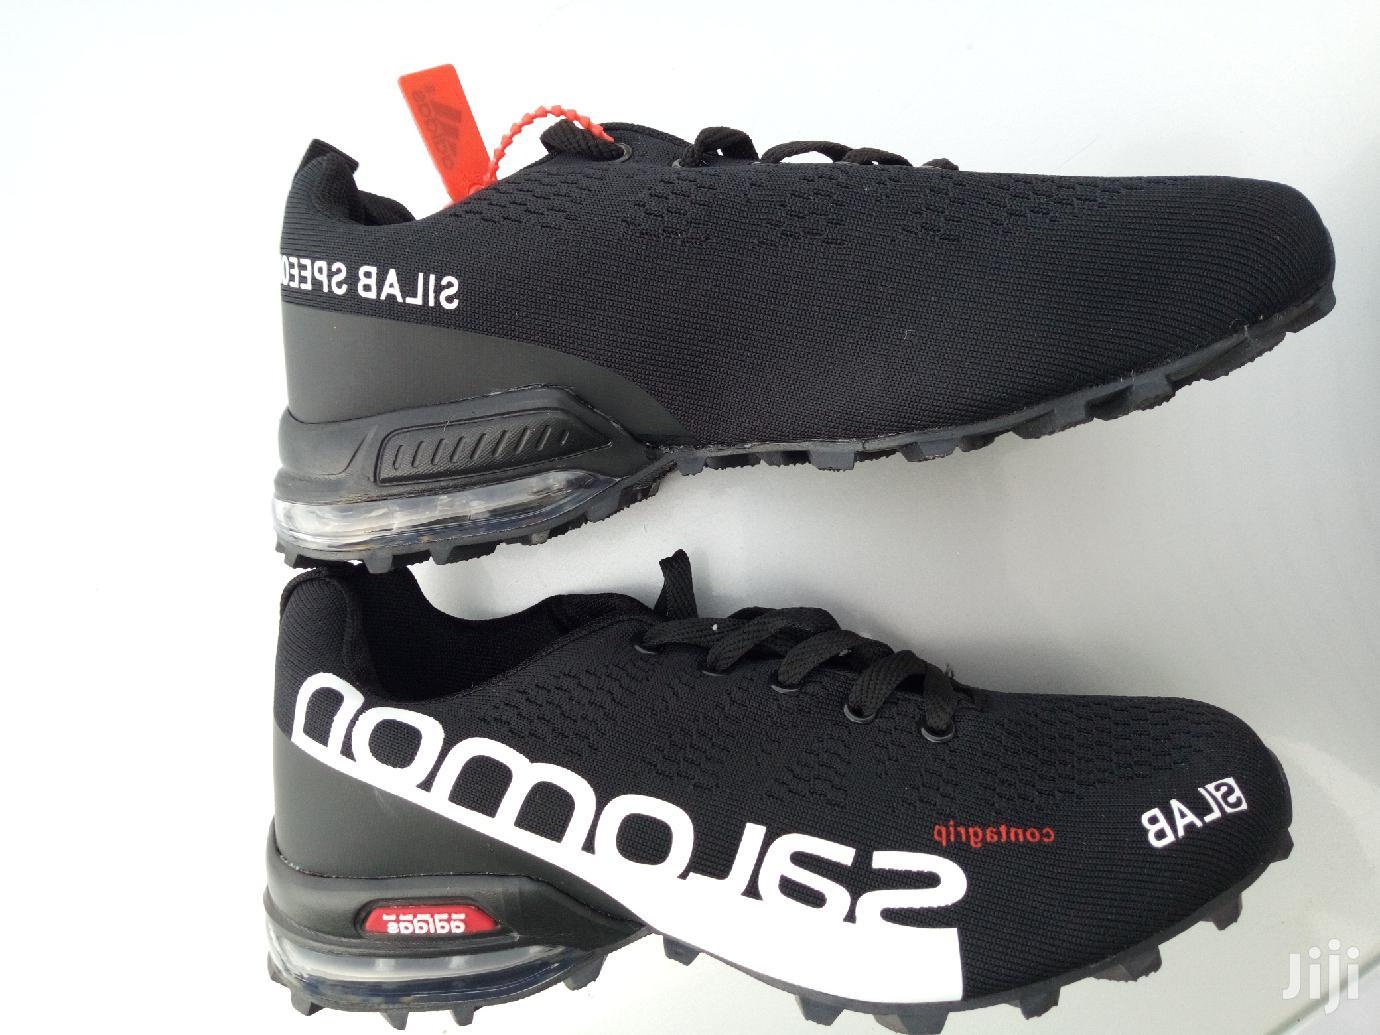 Adidas Salomon Sneakers- Sz 41 in Ga